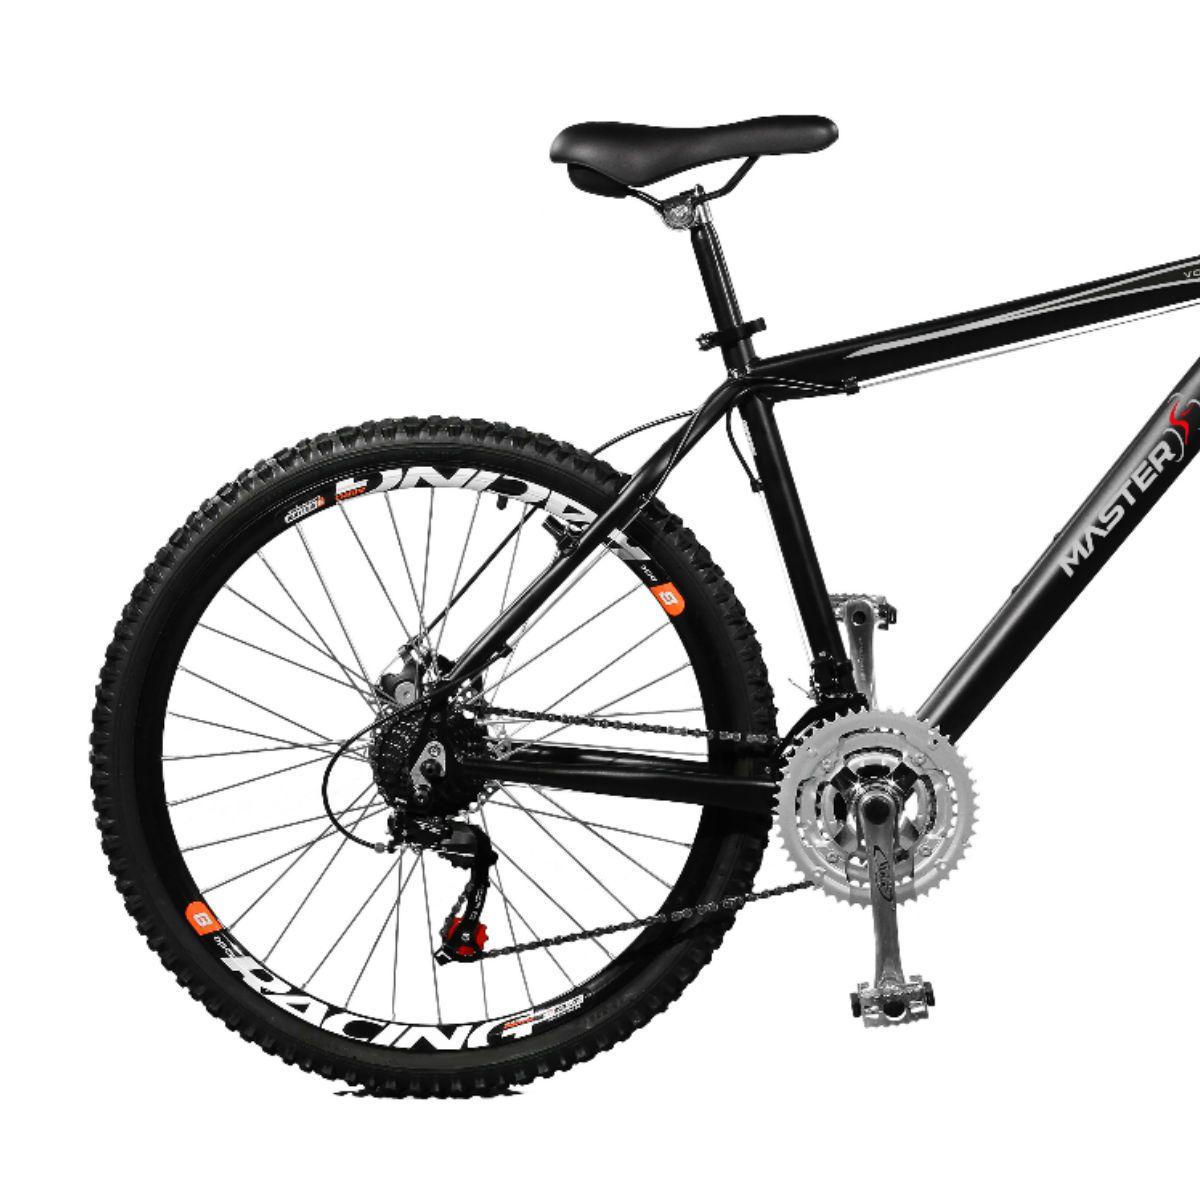 Bicicleta Master Bike Aro 26 Volcano Freio à Disco A-36 21 Marchas Preto